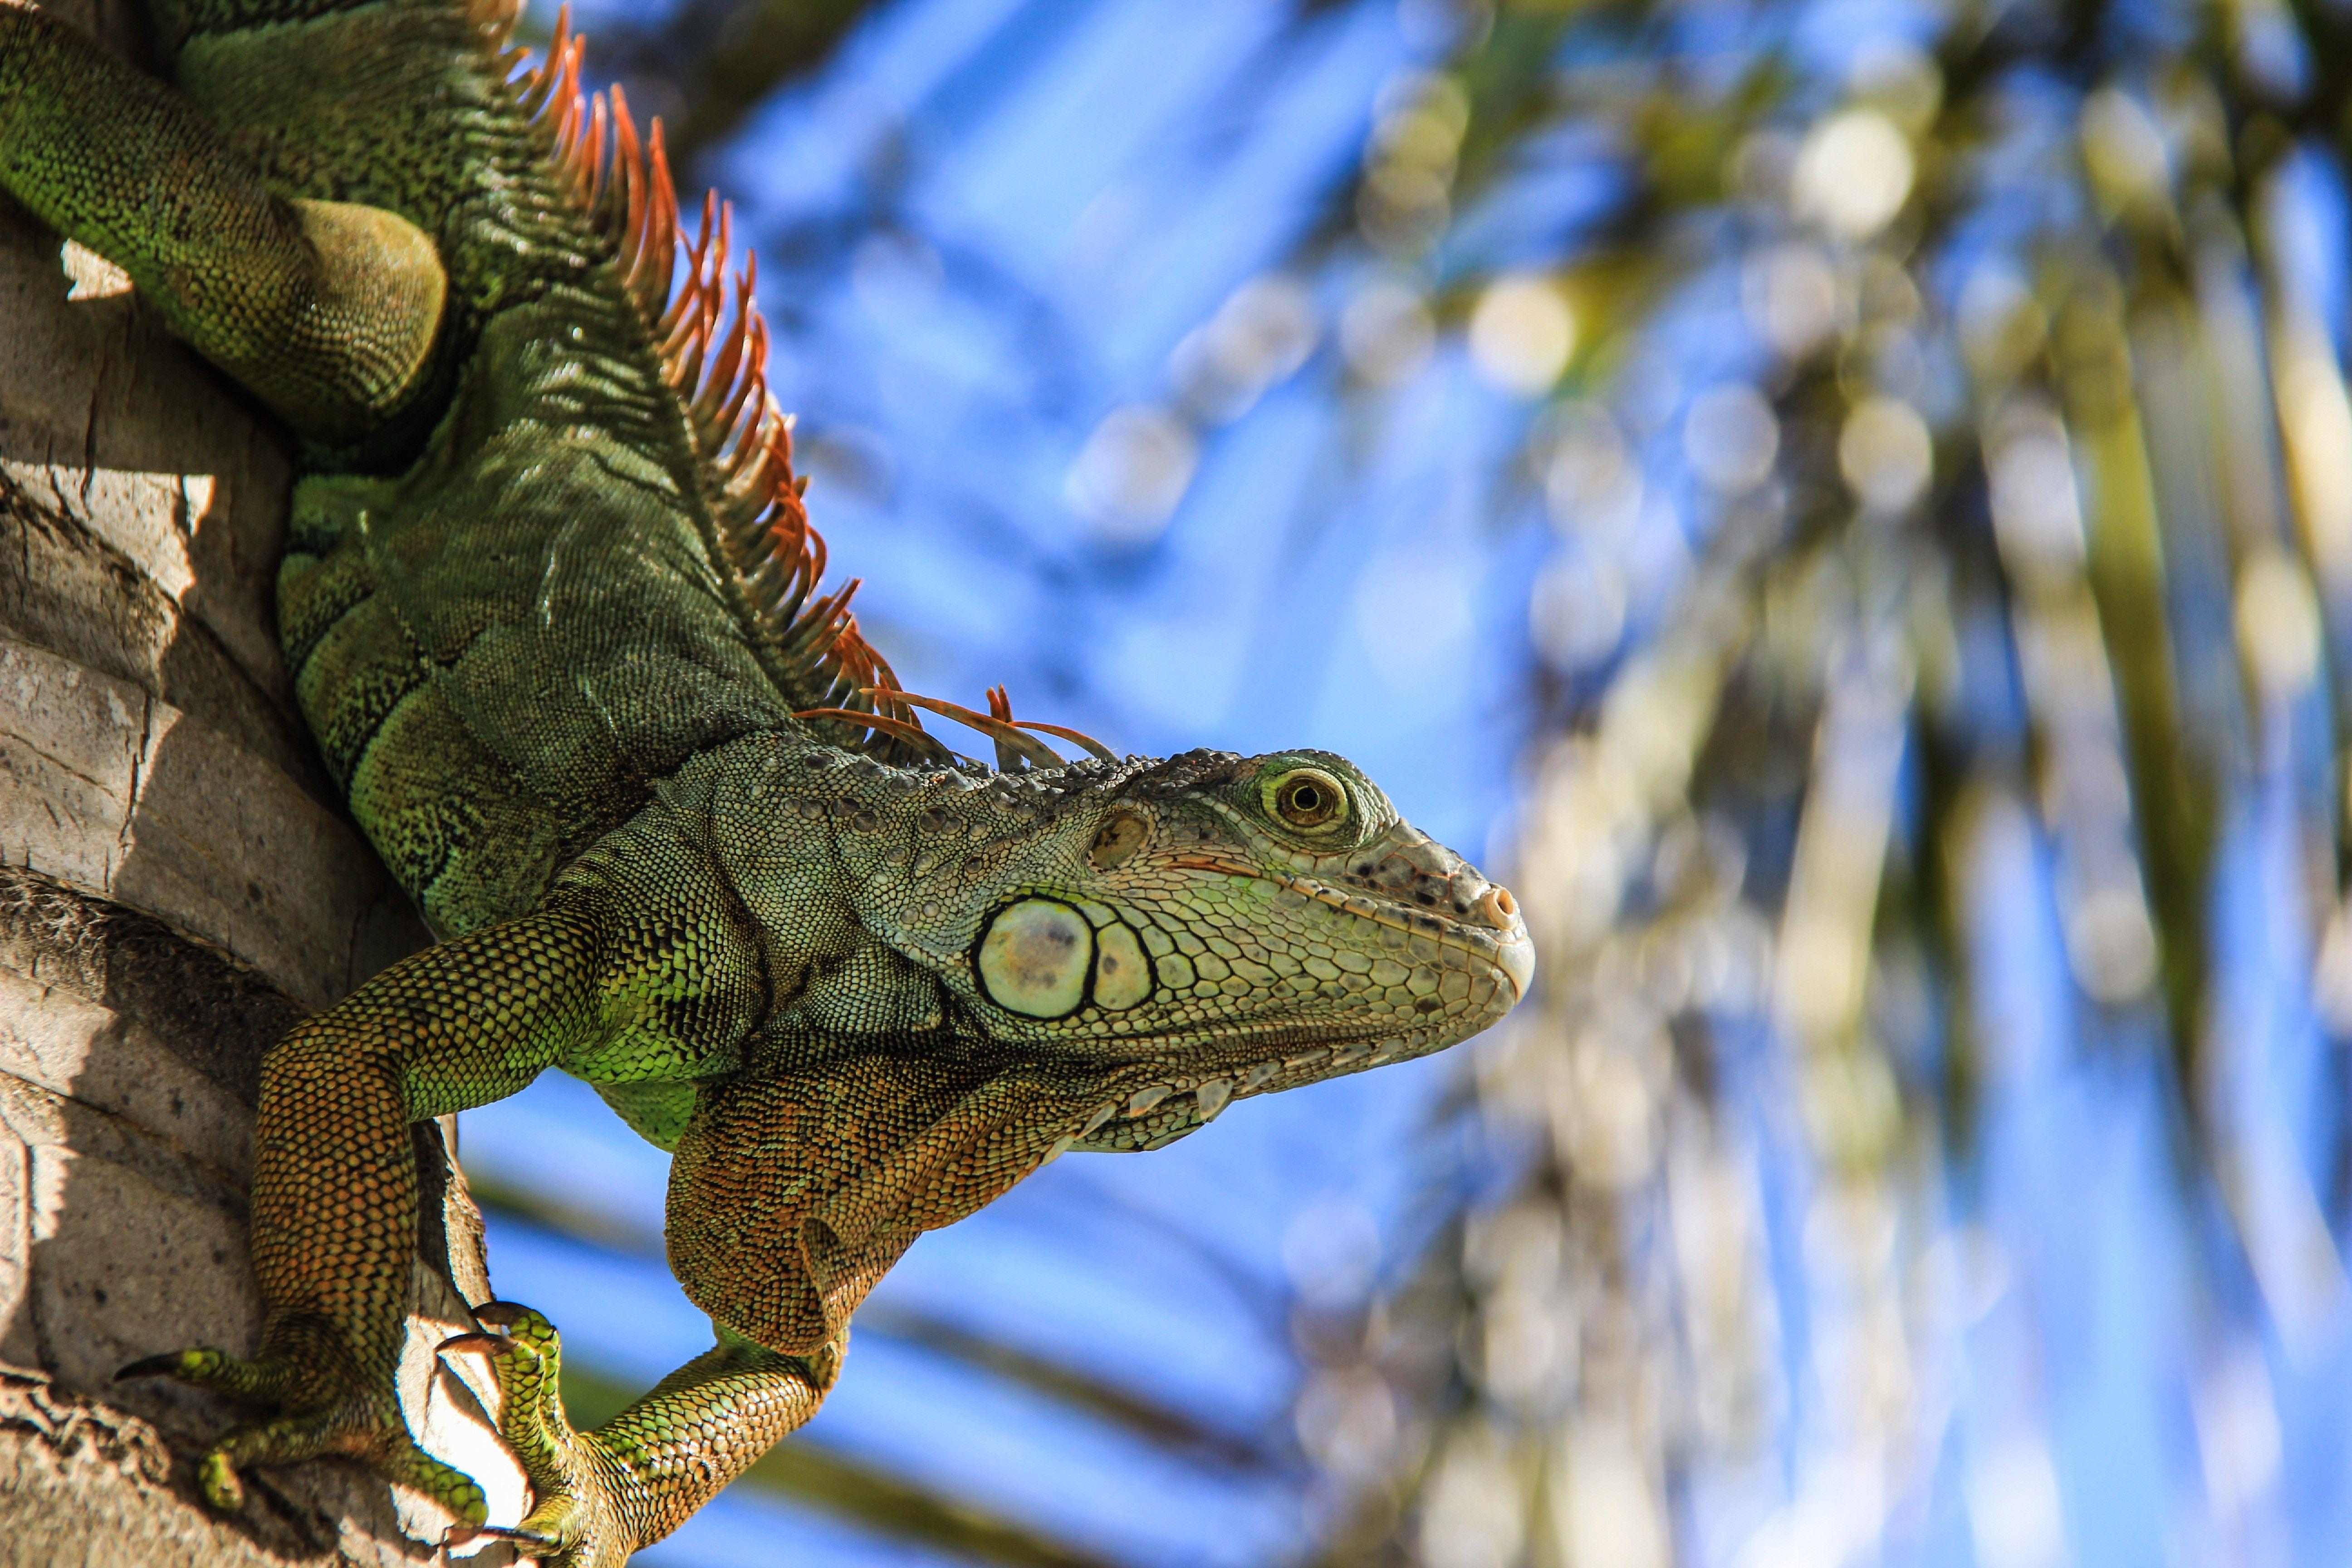 common iguana lizard wallpaper download high resolution